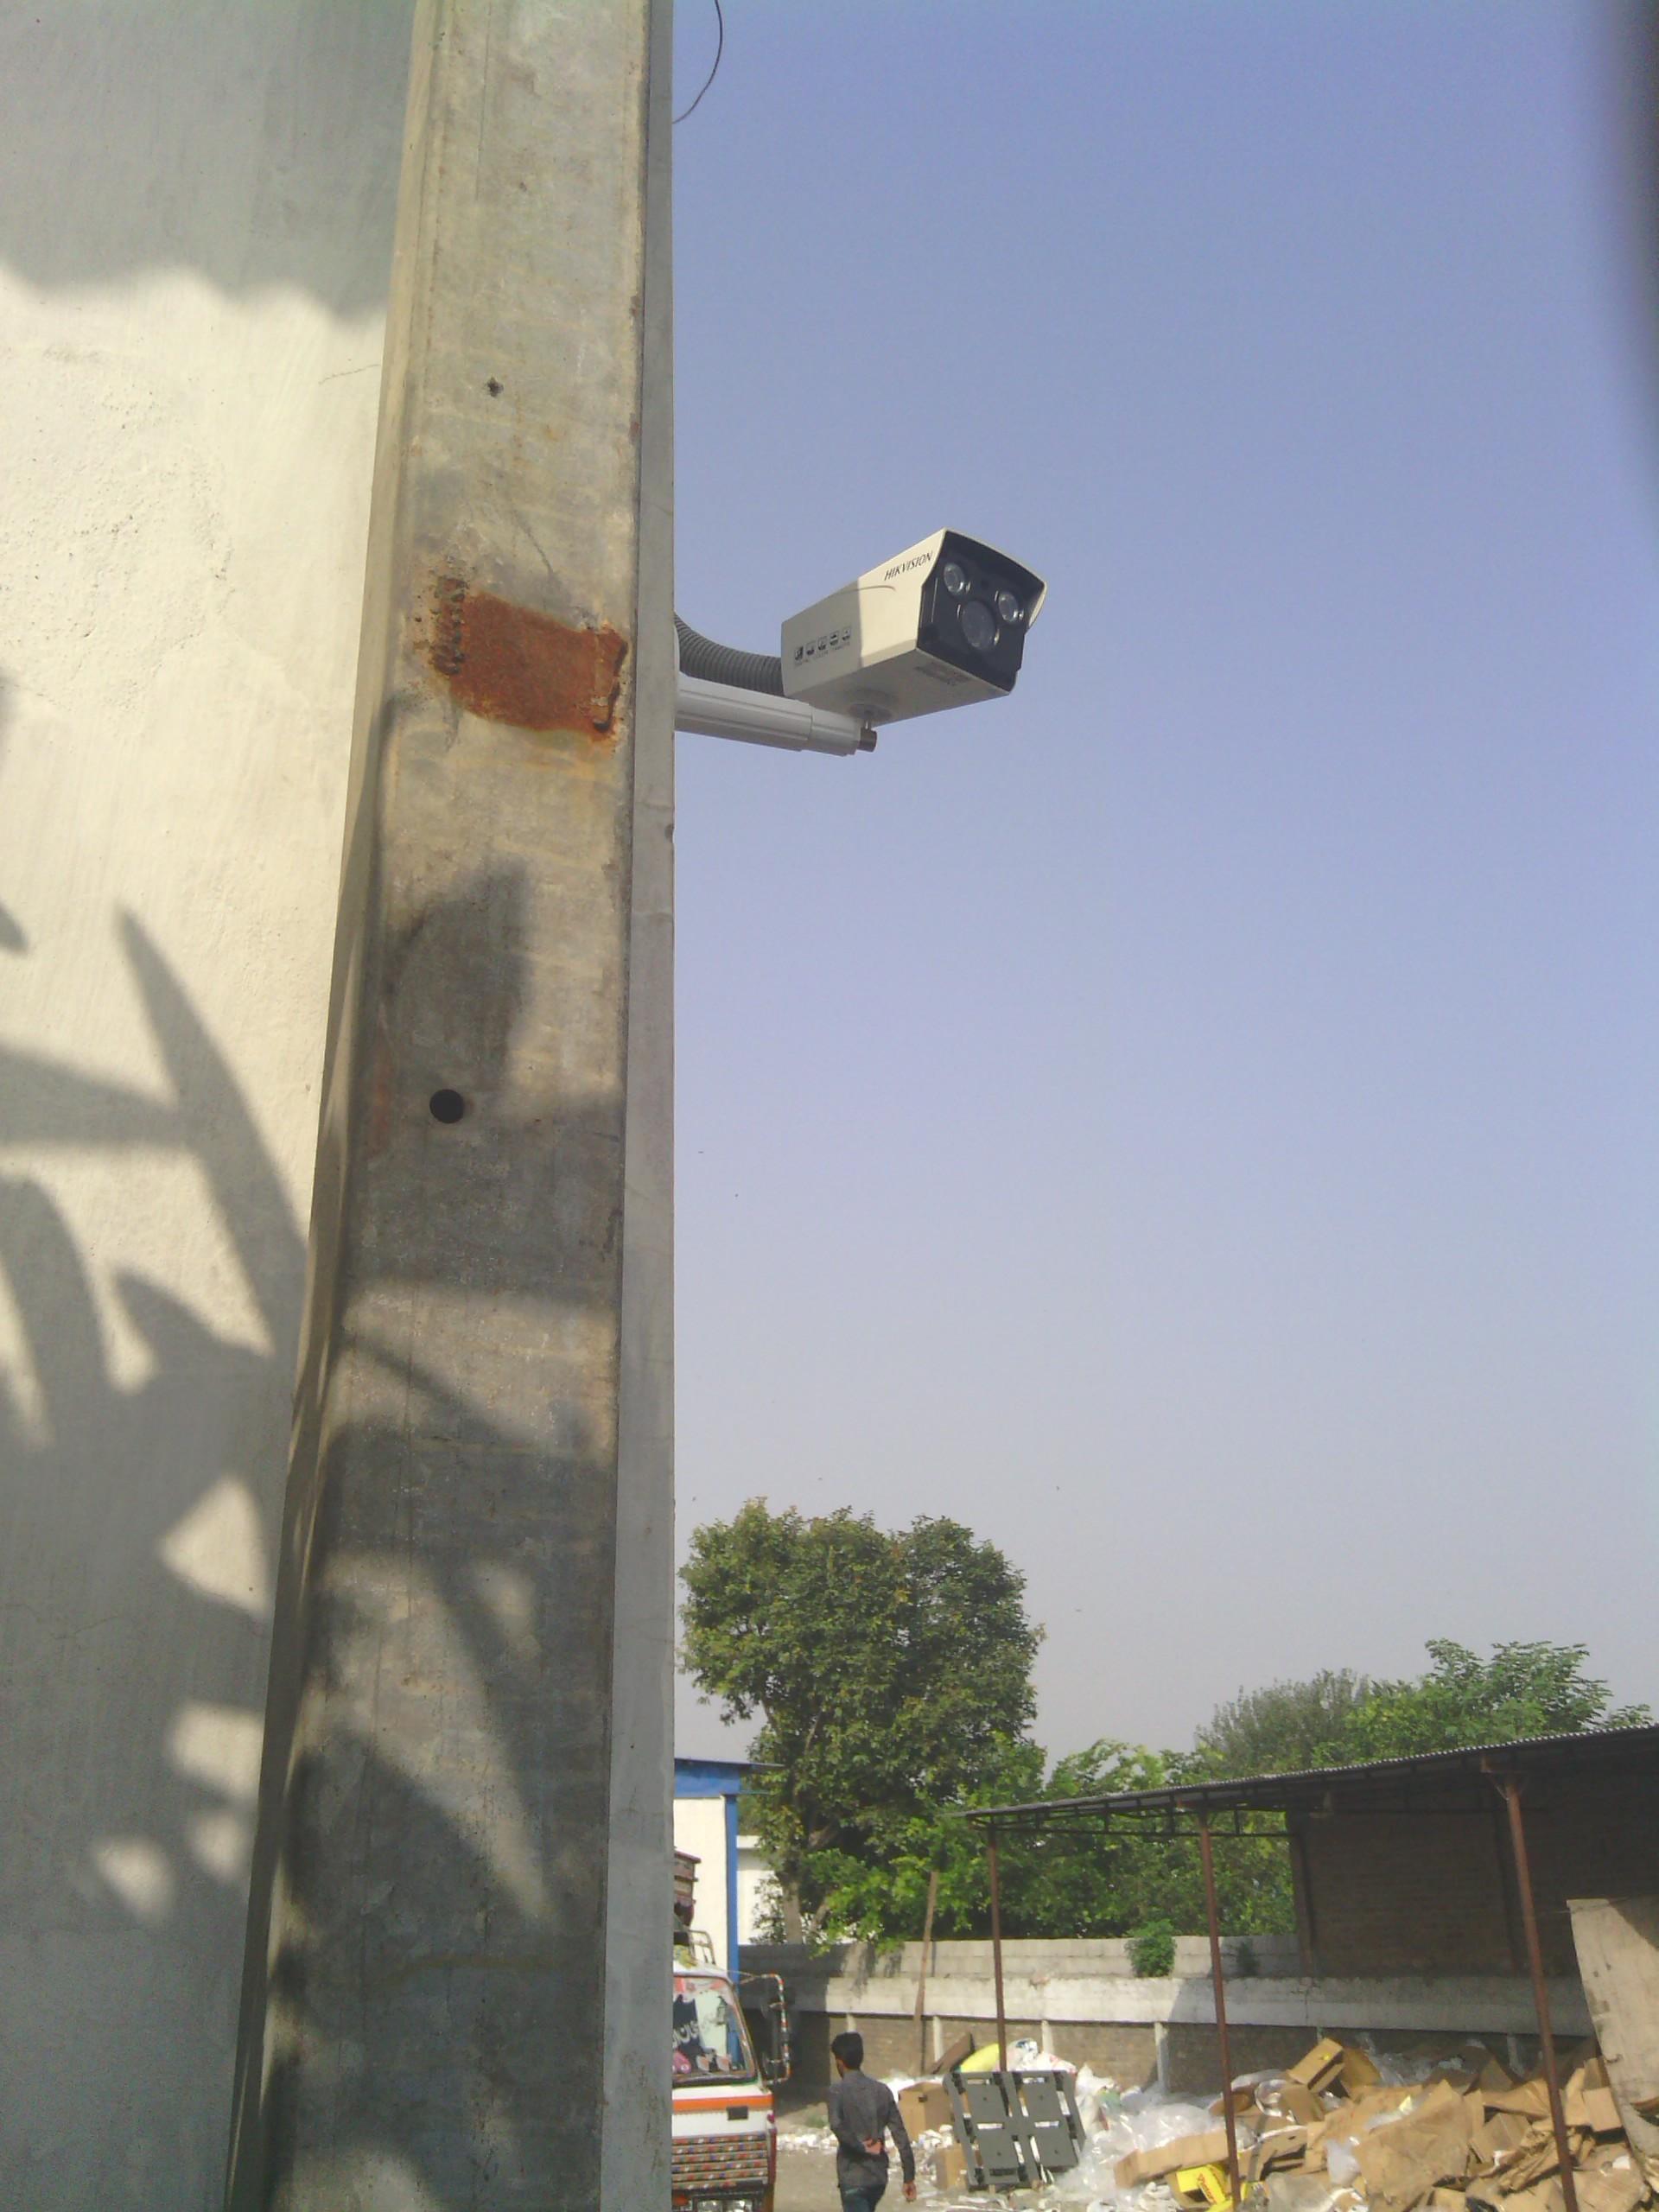 CCTV in Islamabad, CCTV in Pakistan, Cameras in Islamabad, Security Cameras in Pakistan, Sacurity Cameras in Pakistan, CCTV in Islamabad, IPC islamabad, IP Cameras in Islamabad, IP Cam islamabad, ip cam rawalpindi, best camera company islamabad, best camera company in islamabad, cctv jobs in islamabad, cctv camera in islamabad, cctv companies in islamabad, cctv installation in islamabad, cctv camera installation in islamabad, cctv camera dealer in islamabad, cctv camera prices in rawalpindi, cctv camera prices in islamabad, wifi cctv camera price in pakistan, wireless security camera price in pakistan, cctv wireless camera price in pakistan, security cameras price in pakistan, samsung cctv cameras price in pakistan, cctv camera price in pakistan lahore, small cctv camera price in pakistan, wifi ip camera price in pakistan